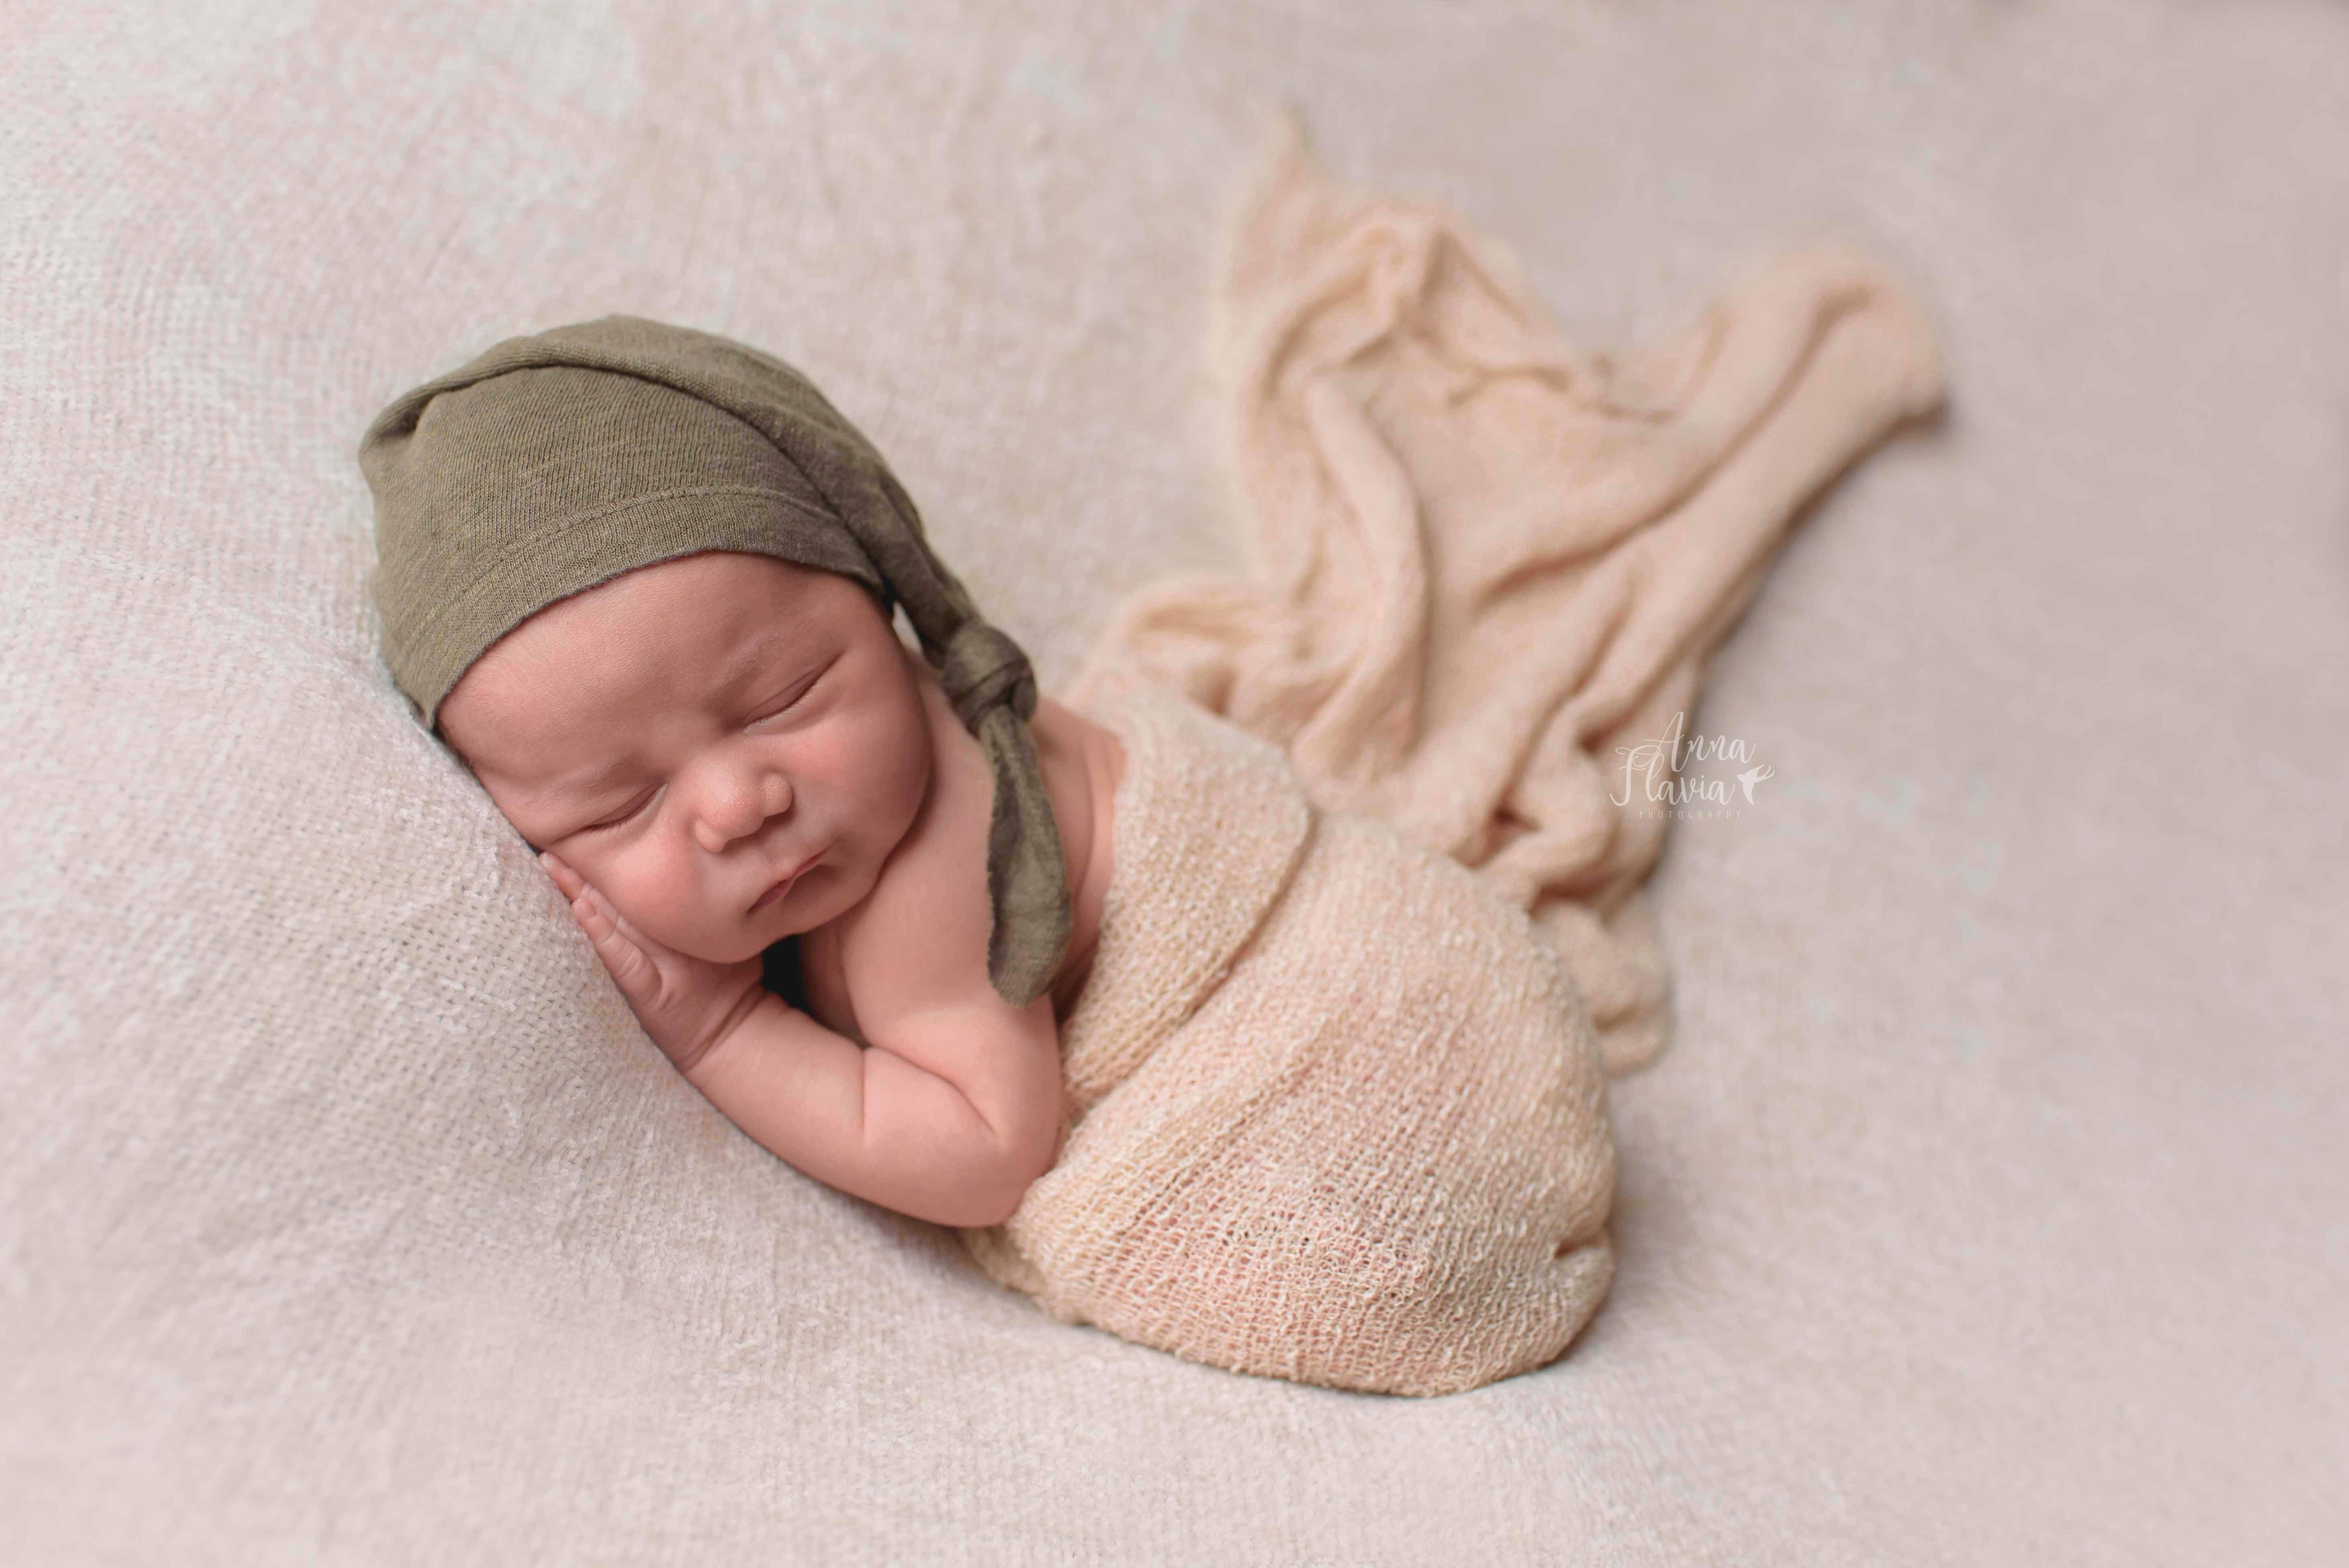 photographer_dublin_anna_flavia_newborn_maternity_17